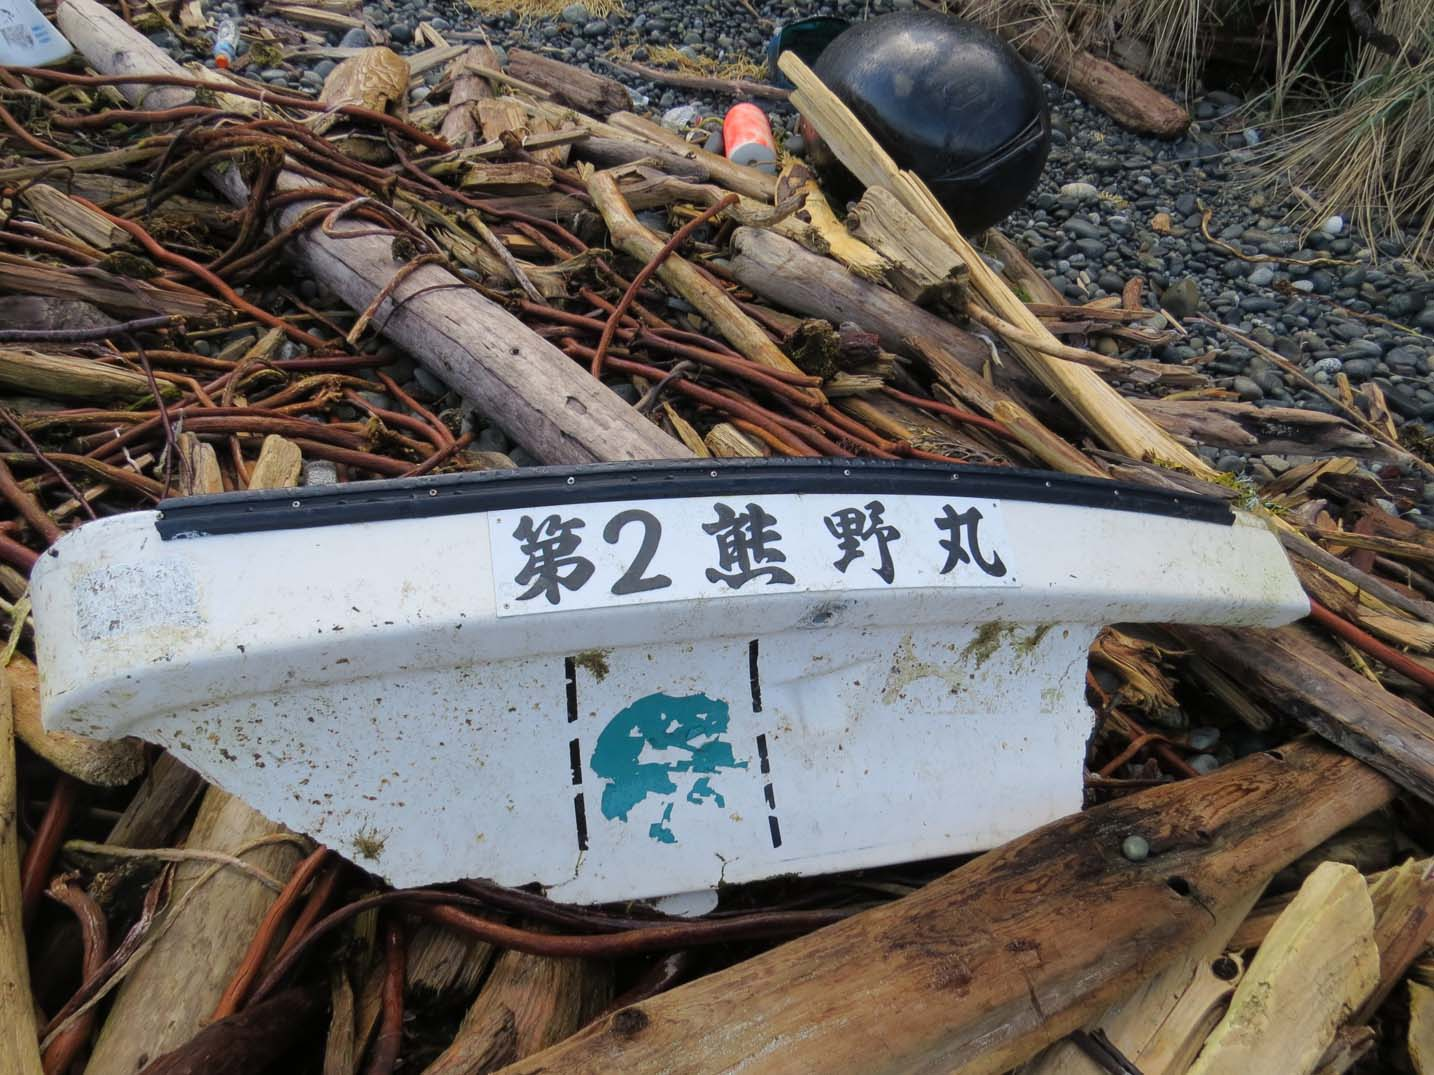 Cape Scott Provincial Park Japanese tsunami debris